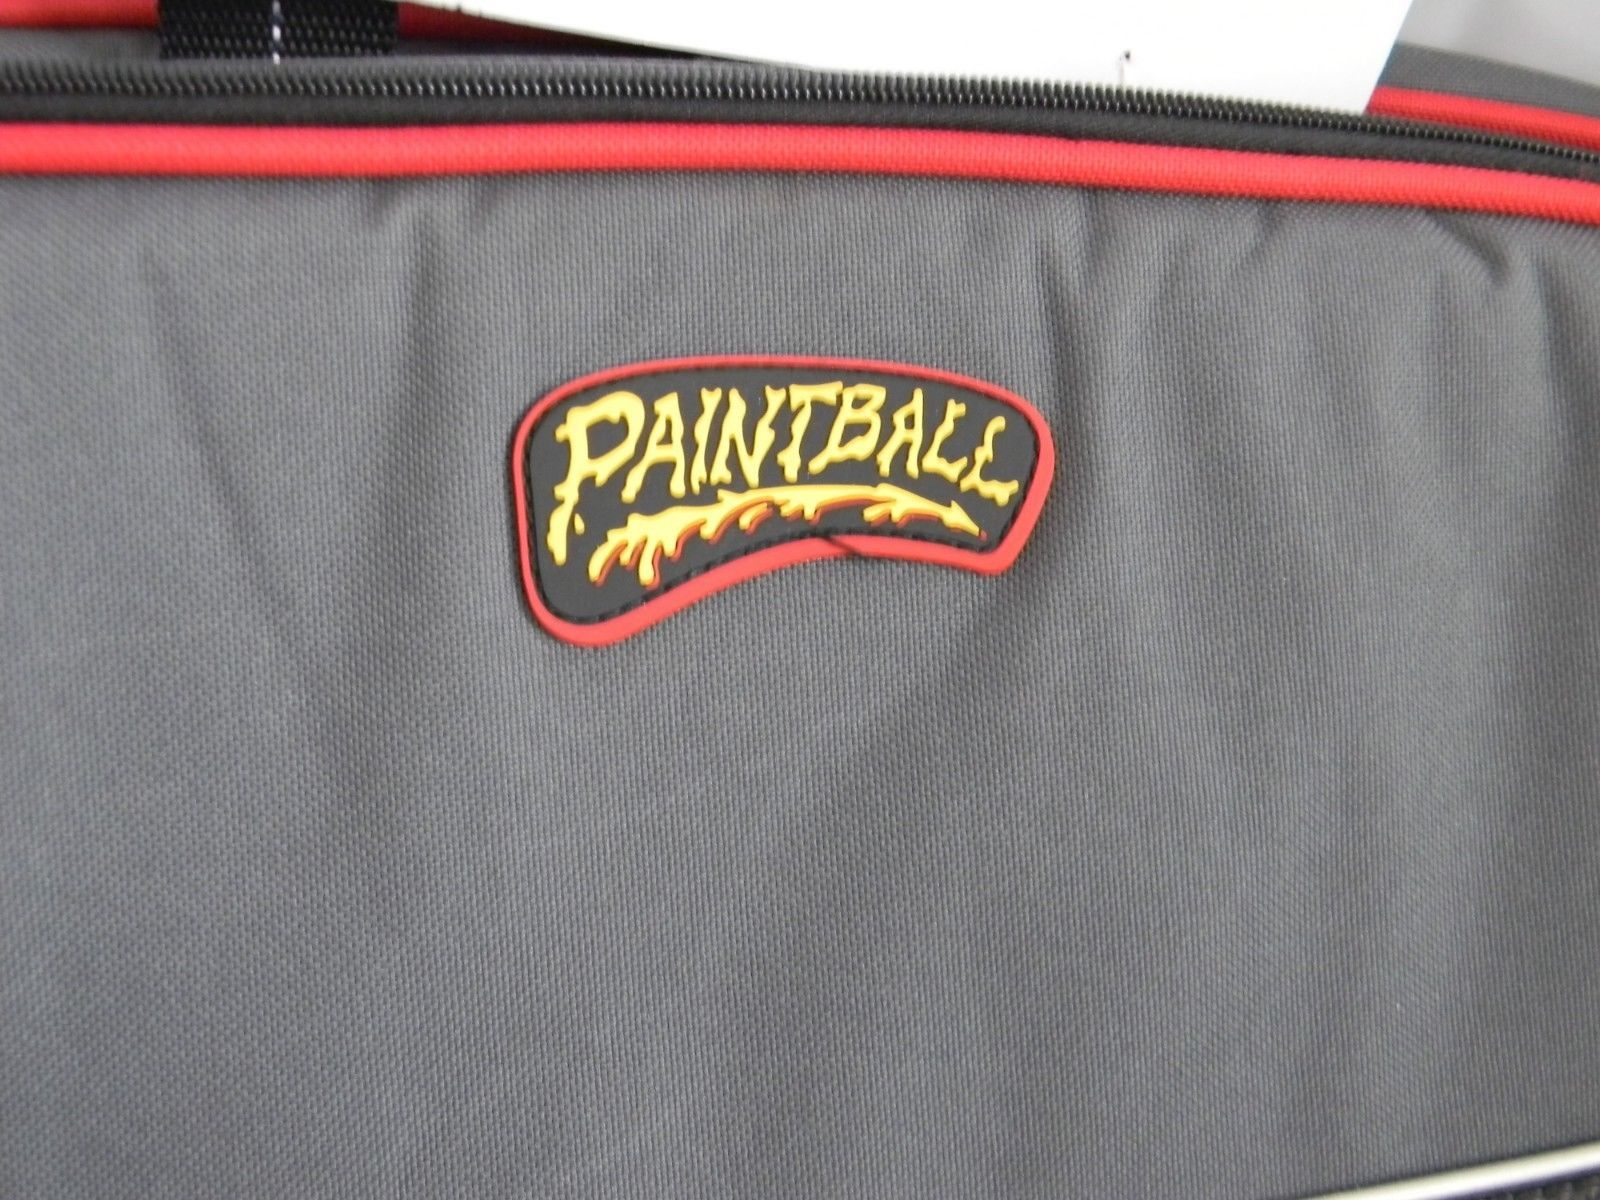 Allen Extreme Paintball Case 10285